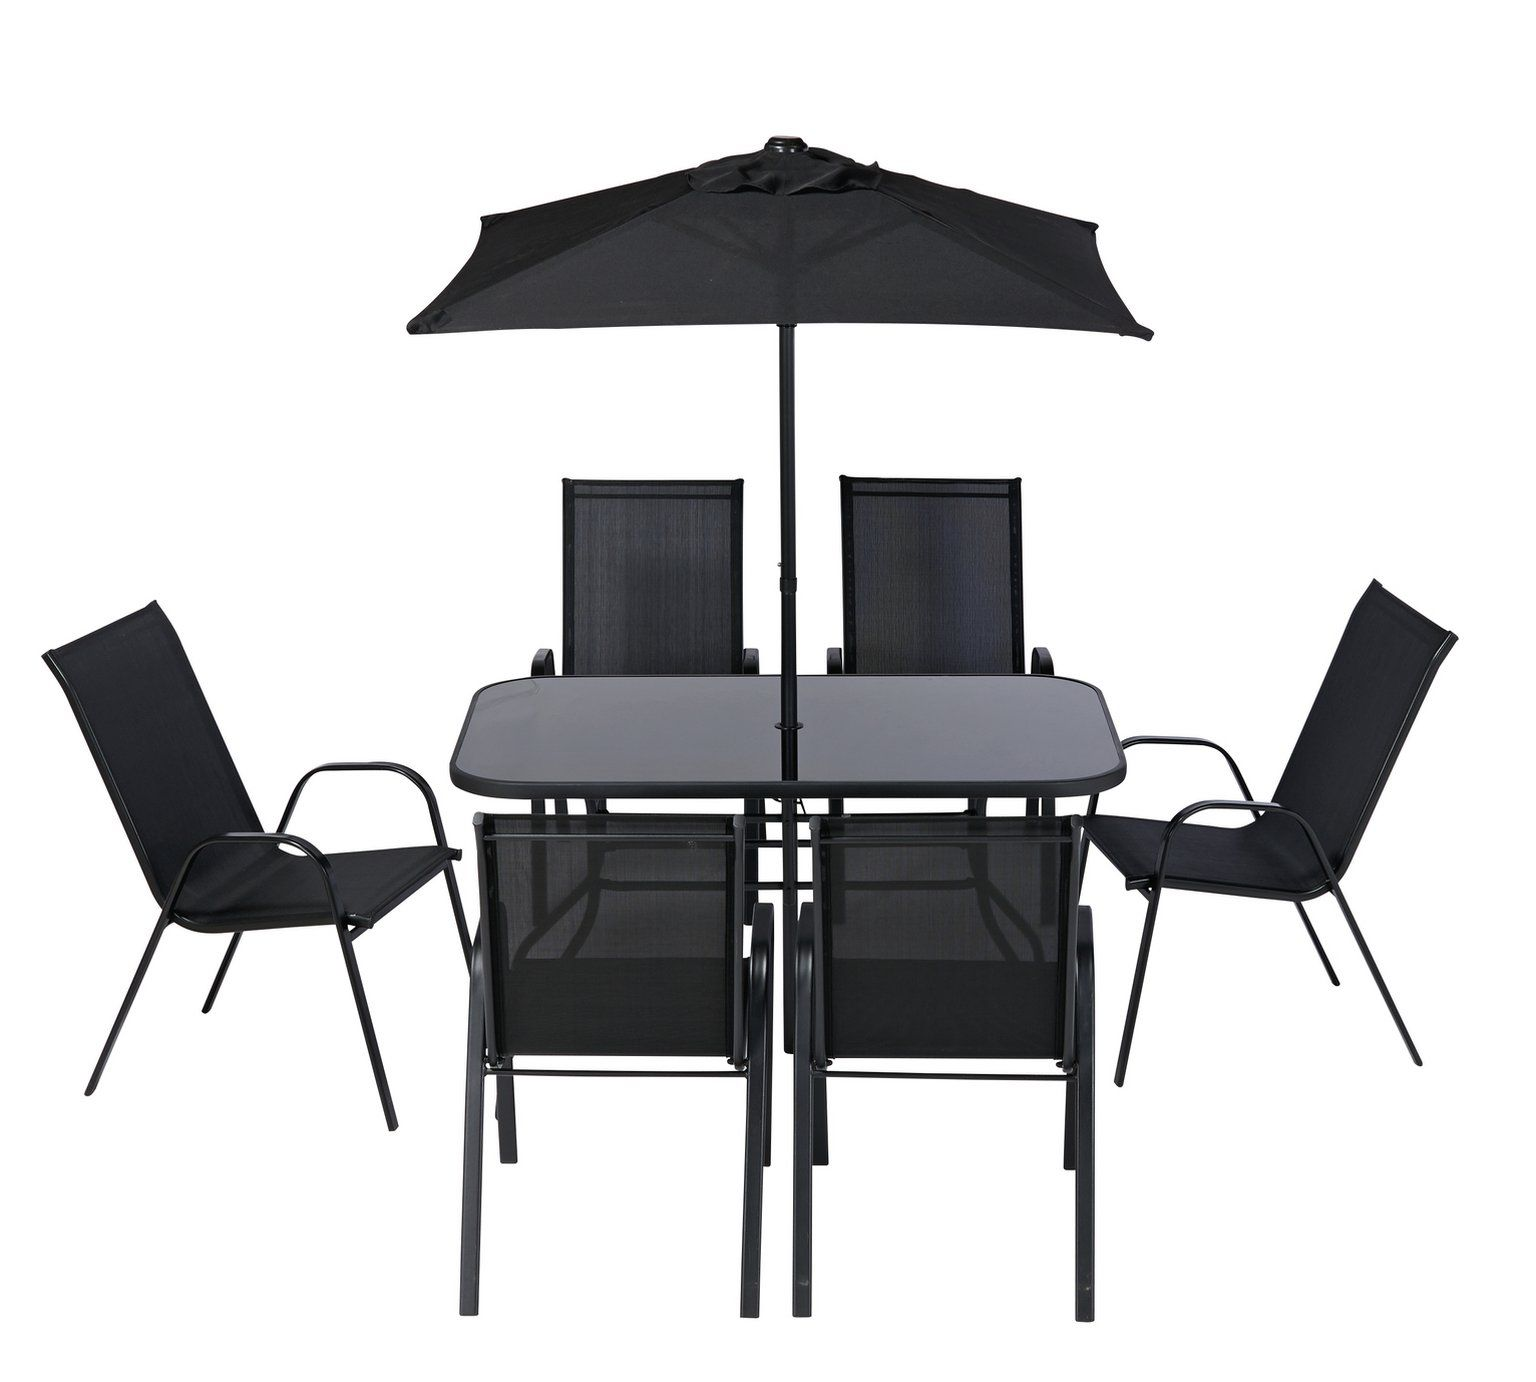 Argos Sicily Garden Table And Chairs: Buy Argos Home Sicily 6 Seater Metal Patio Set